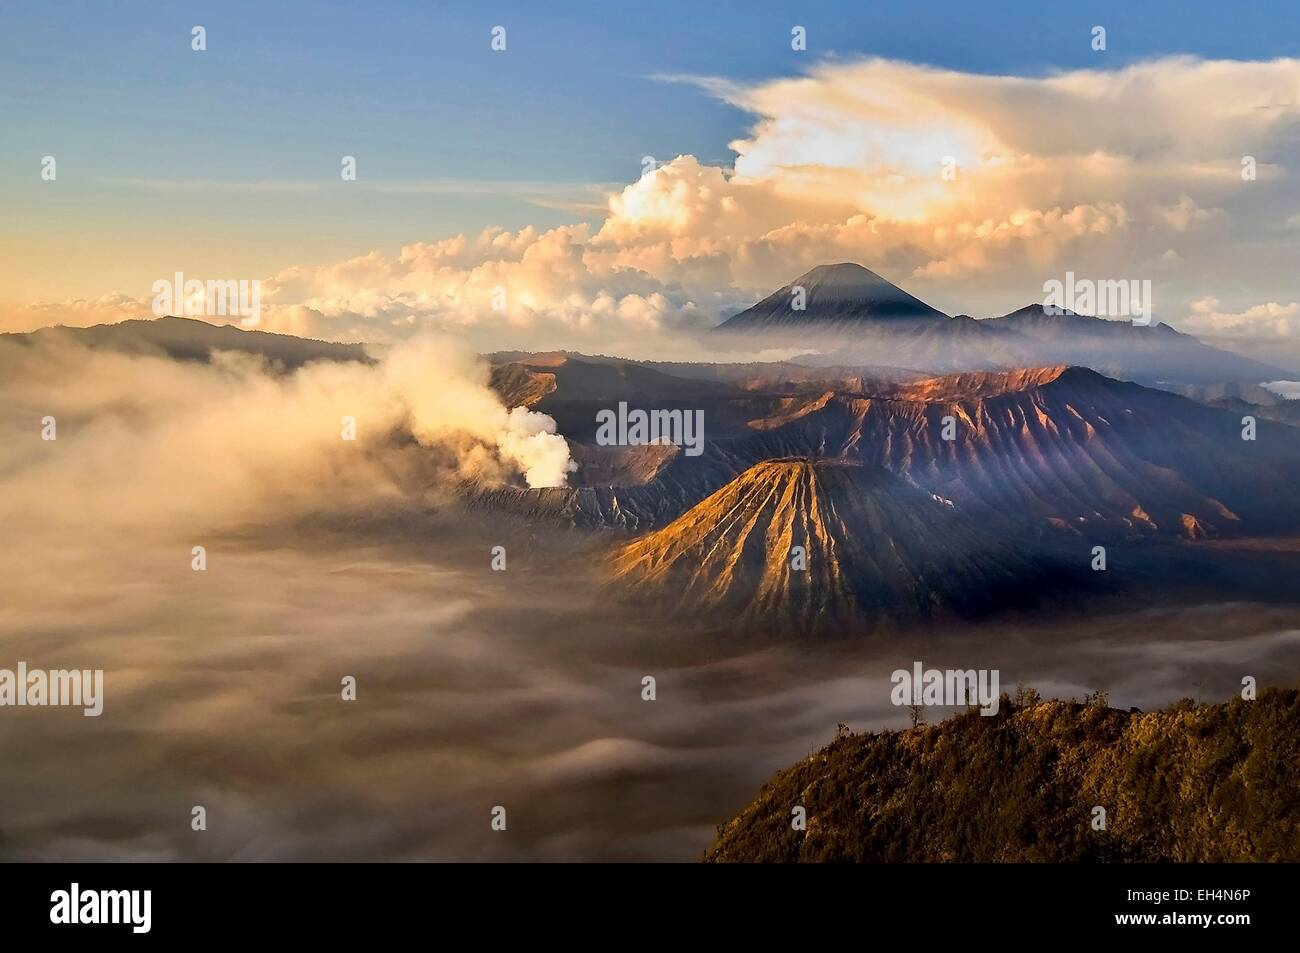 Indonesia, Java, Jawa Timur, Bromo-Tengger-Semeru National Park, sunrise over the volcanoes viewed from mount Penanjakan - Stock Image